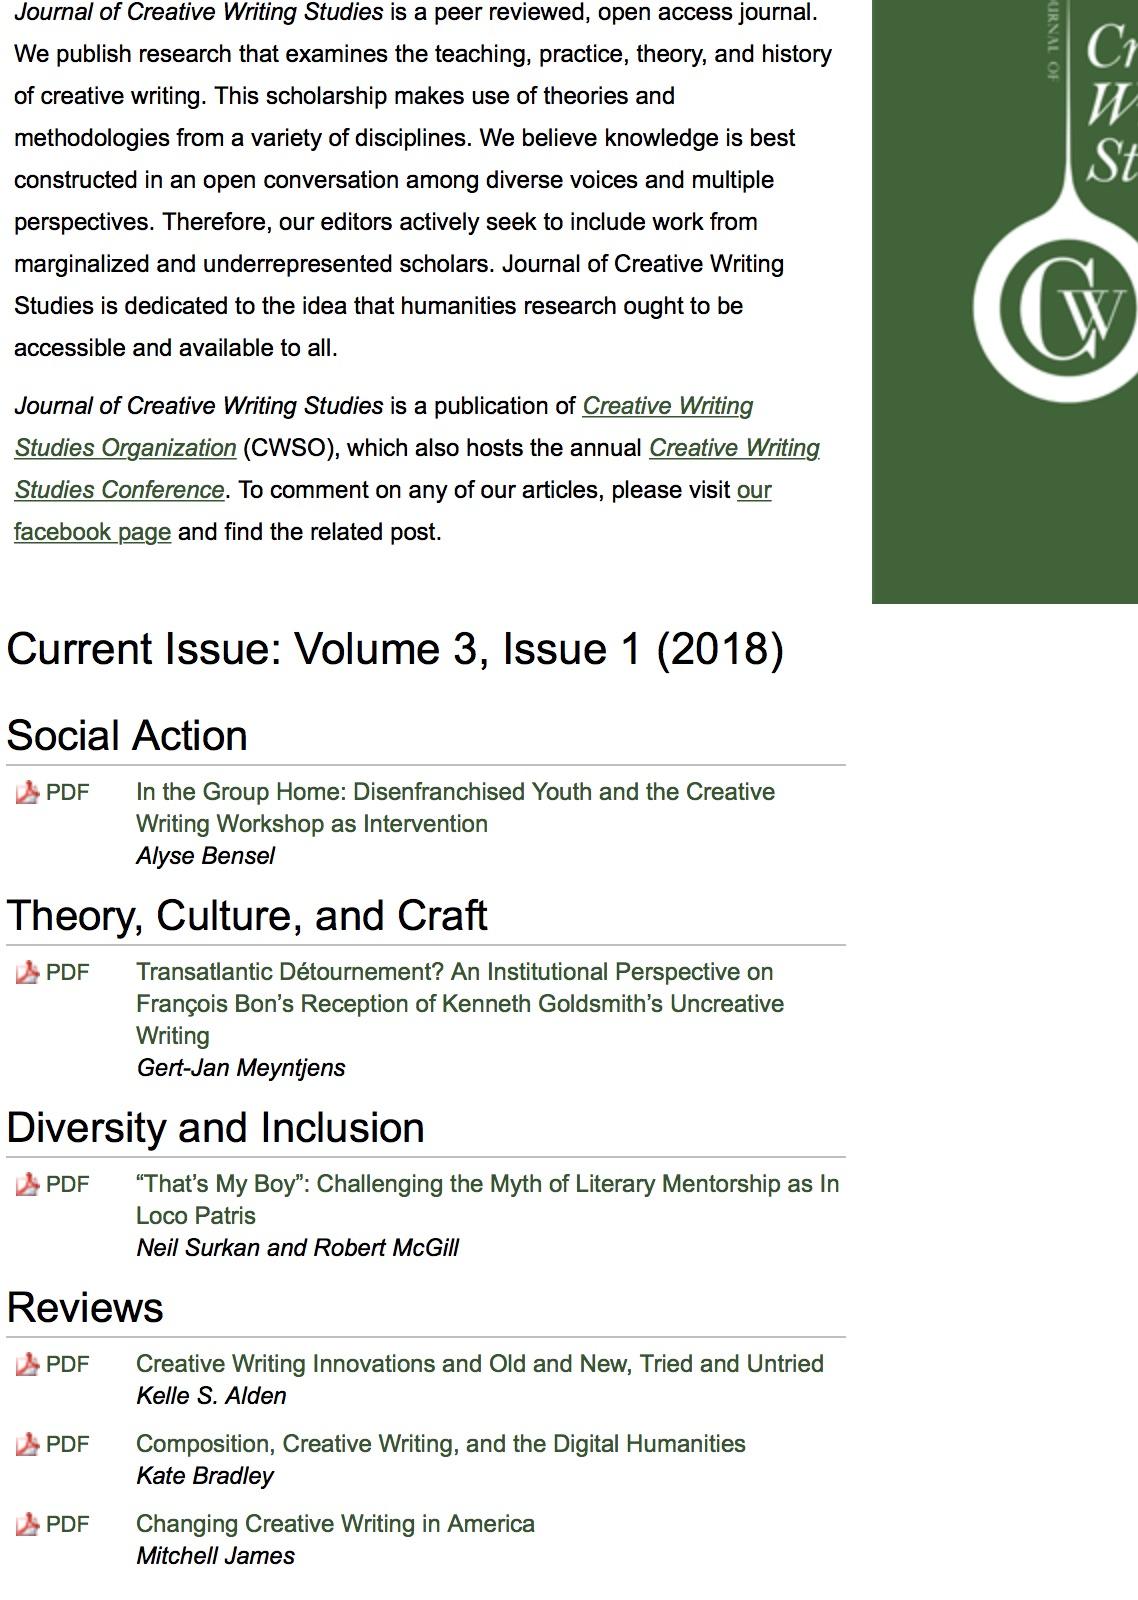 elements of creative writing pdf